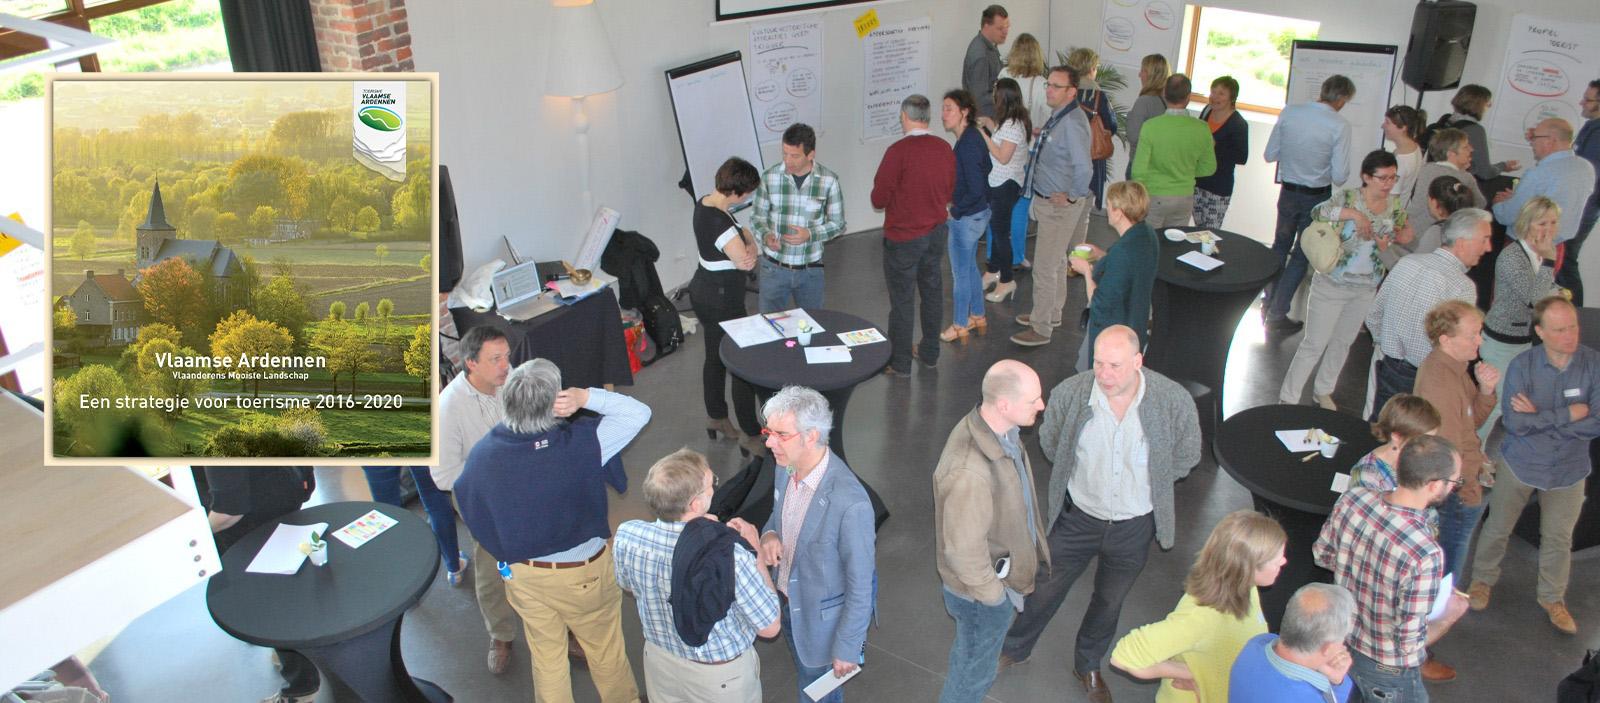 Strategisch Beleidsplan Toerisme in de Vlaamse Ardennen, 2016-2020